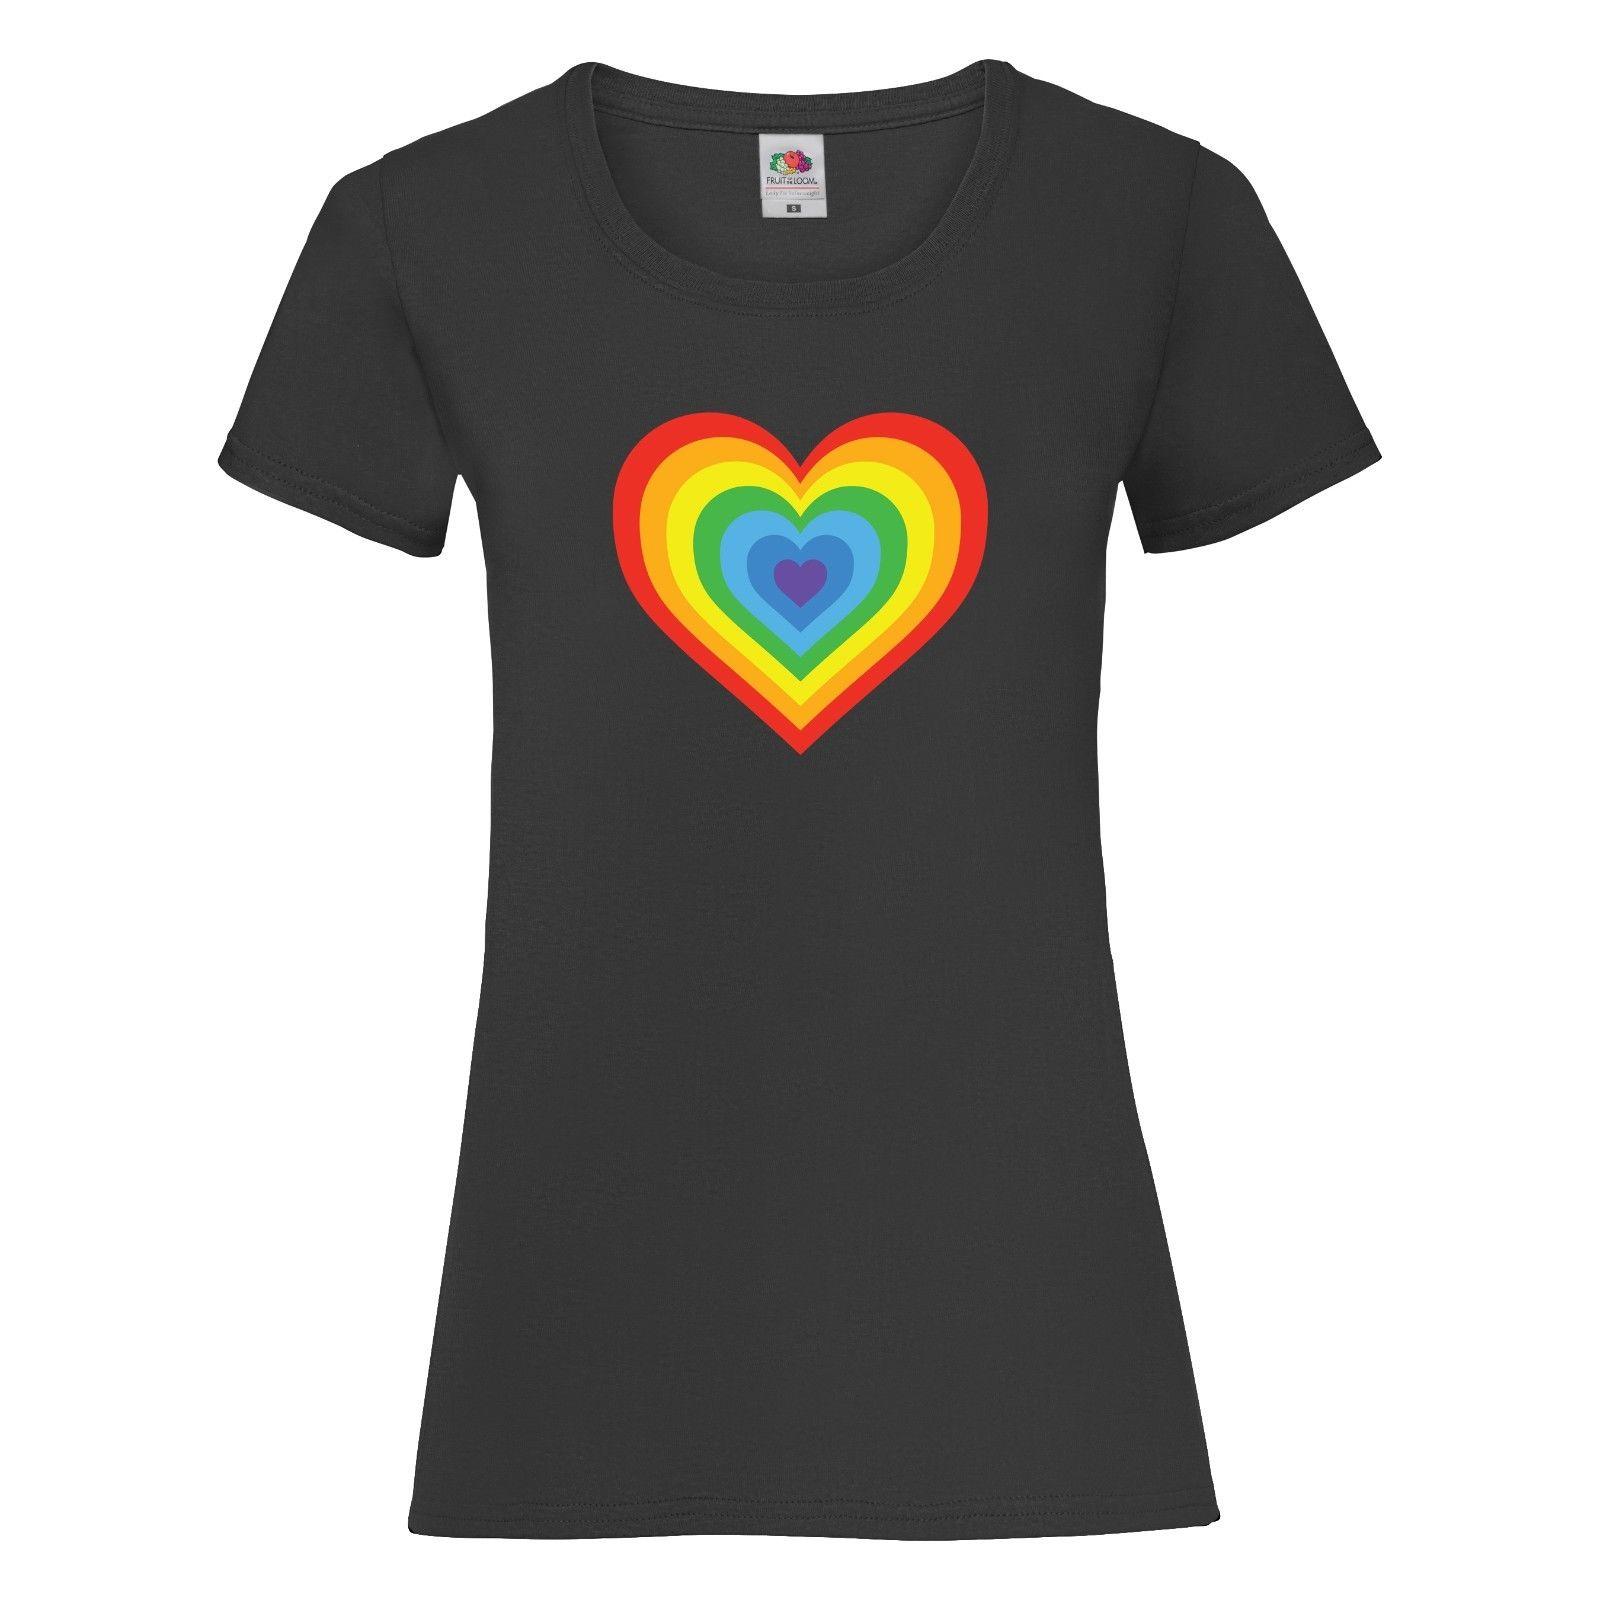 Multiple Heart Rainbow T Shirt Tee Top Womens Ladies Ladyfit Unisex LGBT PrideMen'S T-Shirts Summer Style Fashion Swag Men